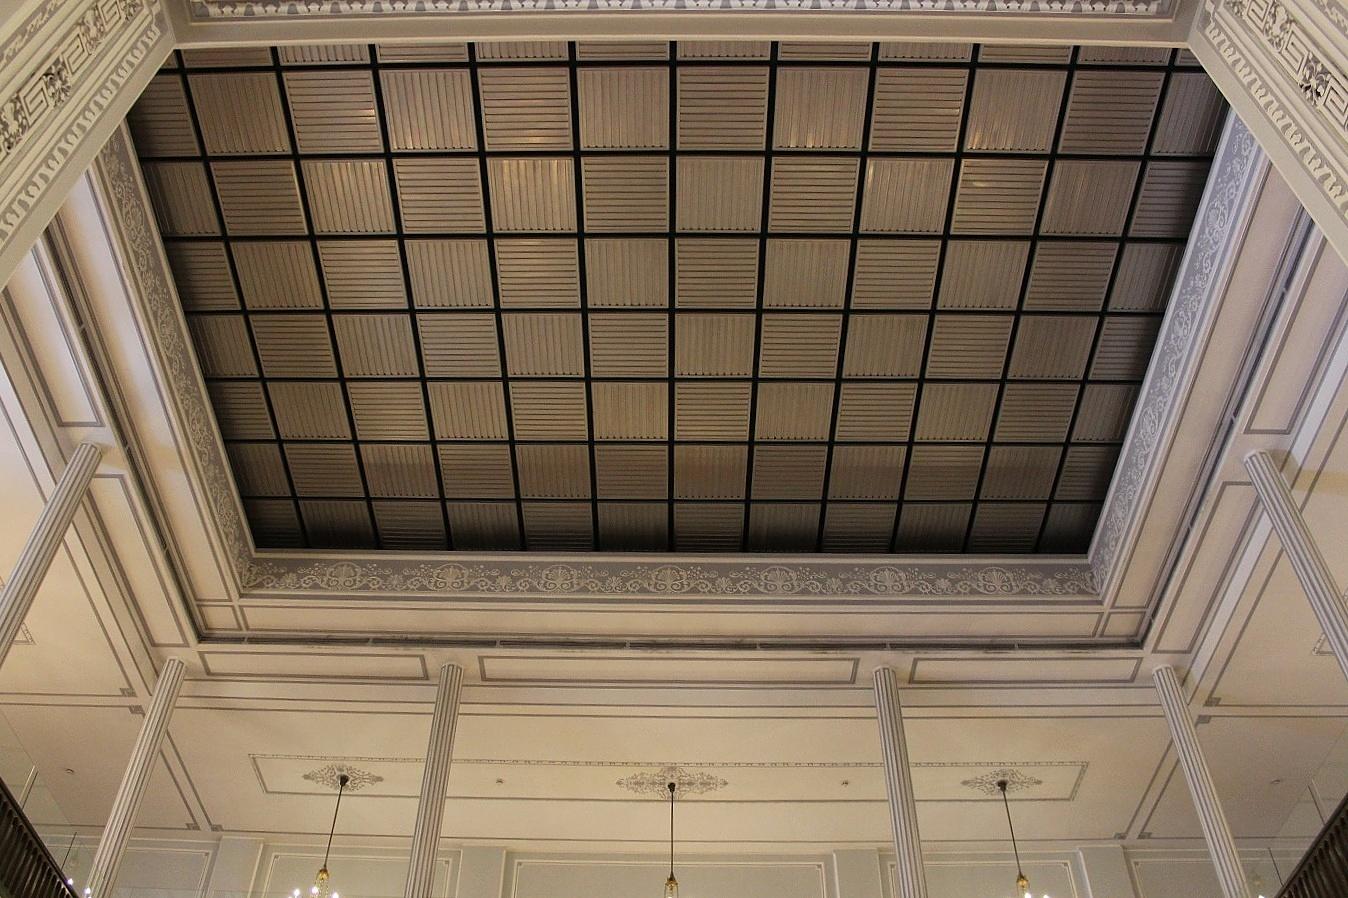 File:سقف متحرک کاخ نیاوران.jpg - Wikimedia CommonsFile:سقف متحرک کاخ نیاوران.jpg